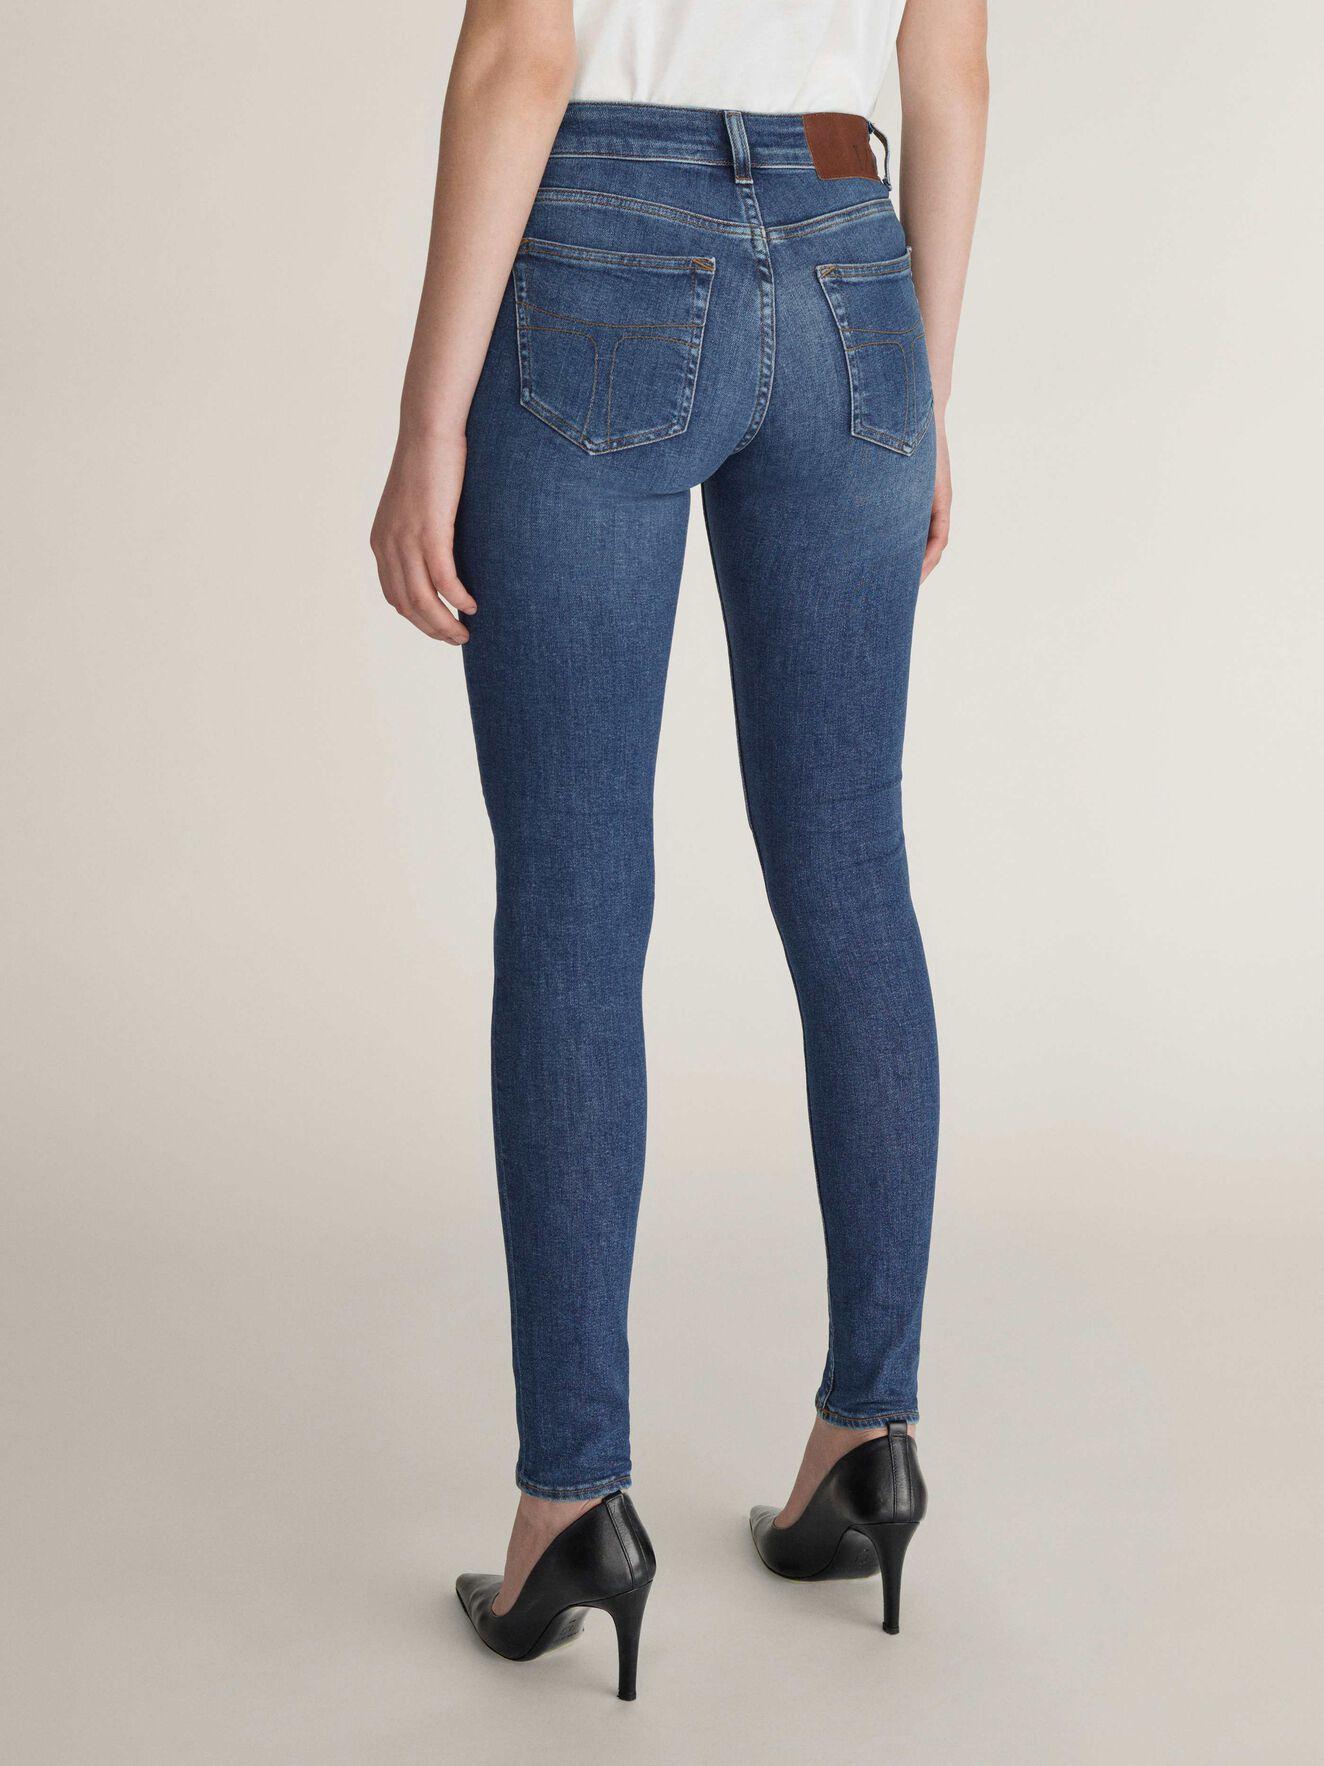 Slight Jeans in Medium Blue from Tiger of Sweden